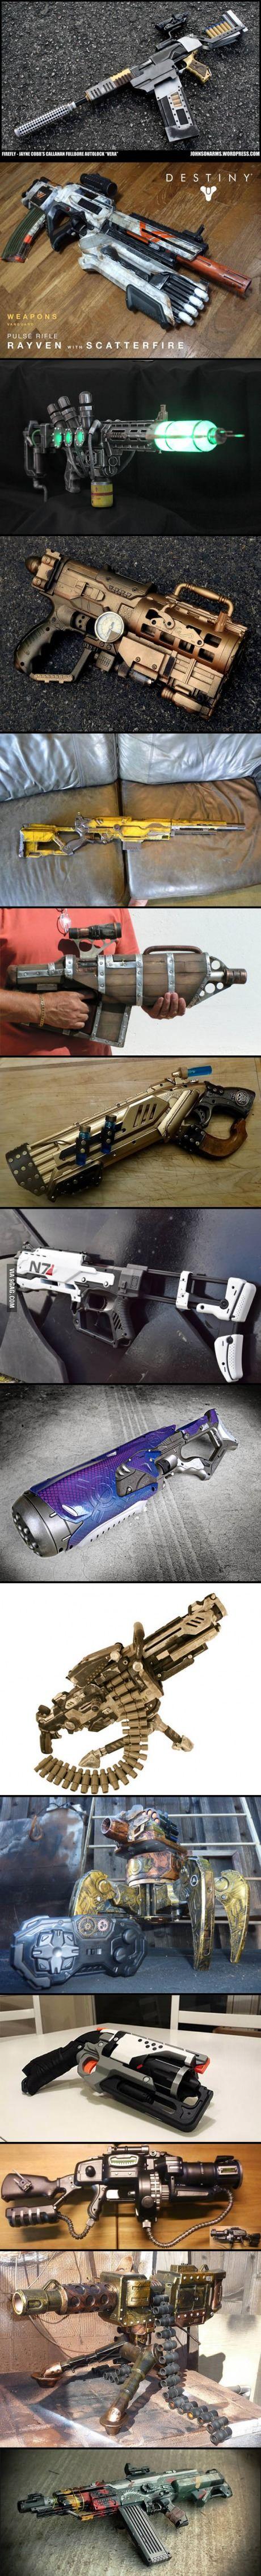 These Custom Nerf Guns Are Just Insane!